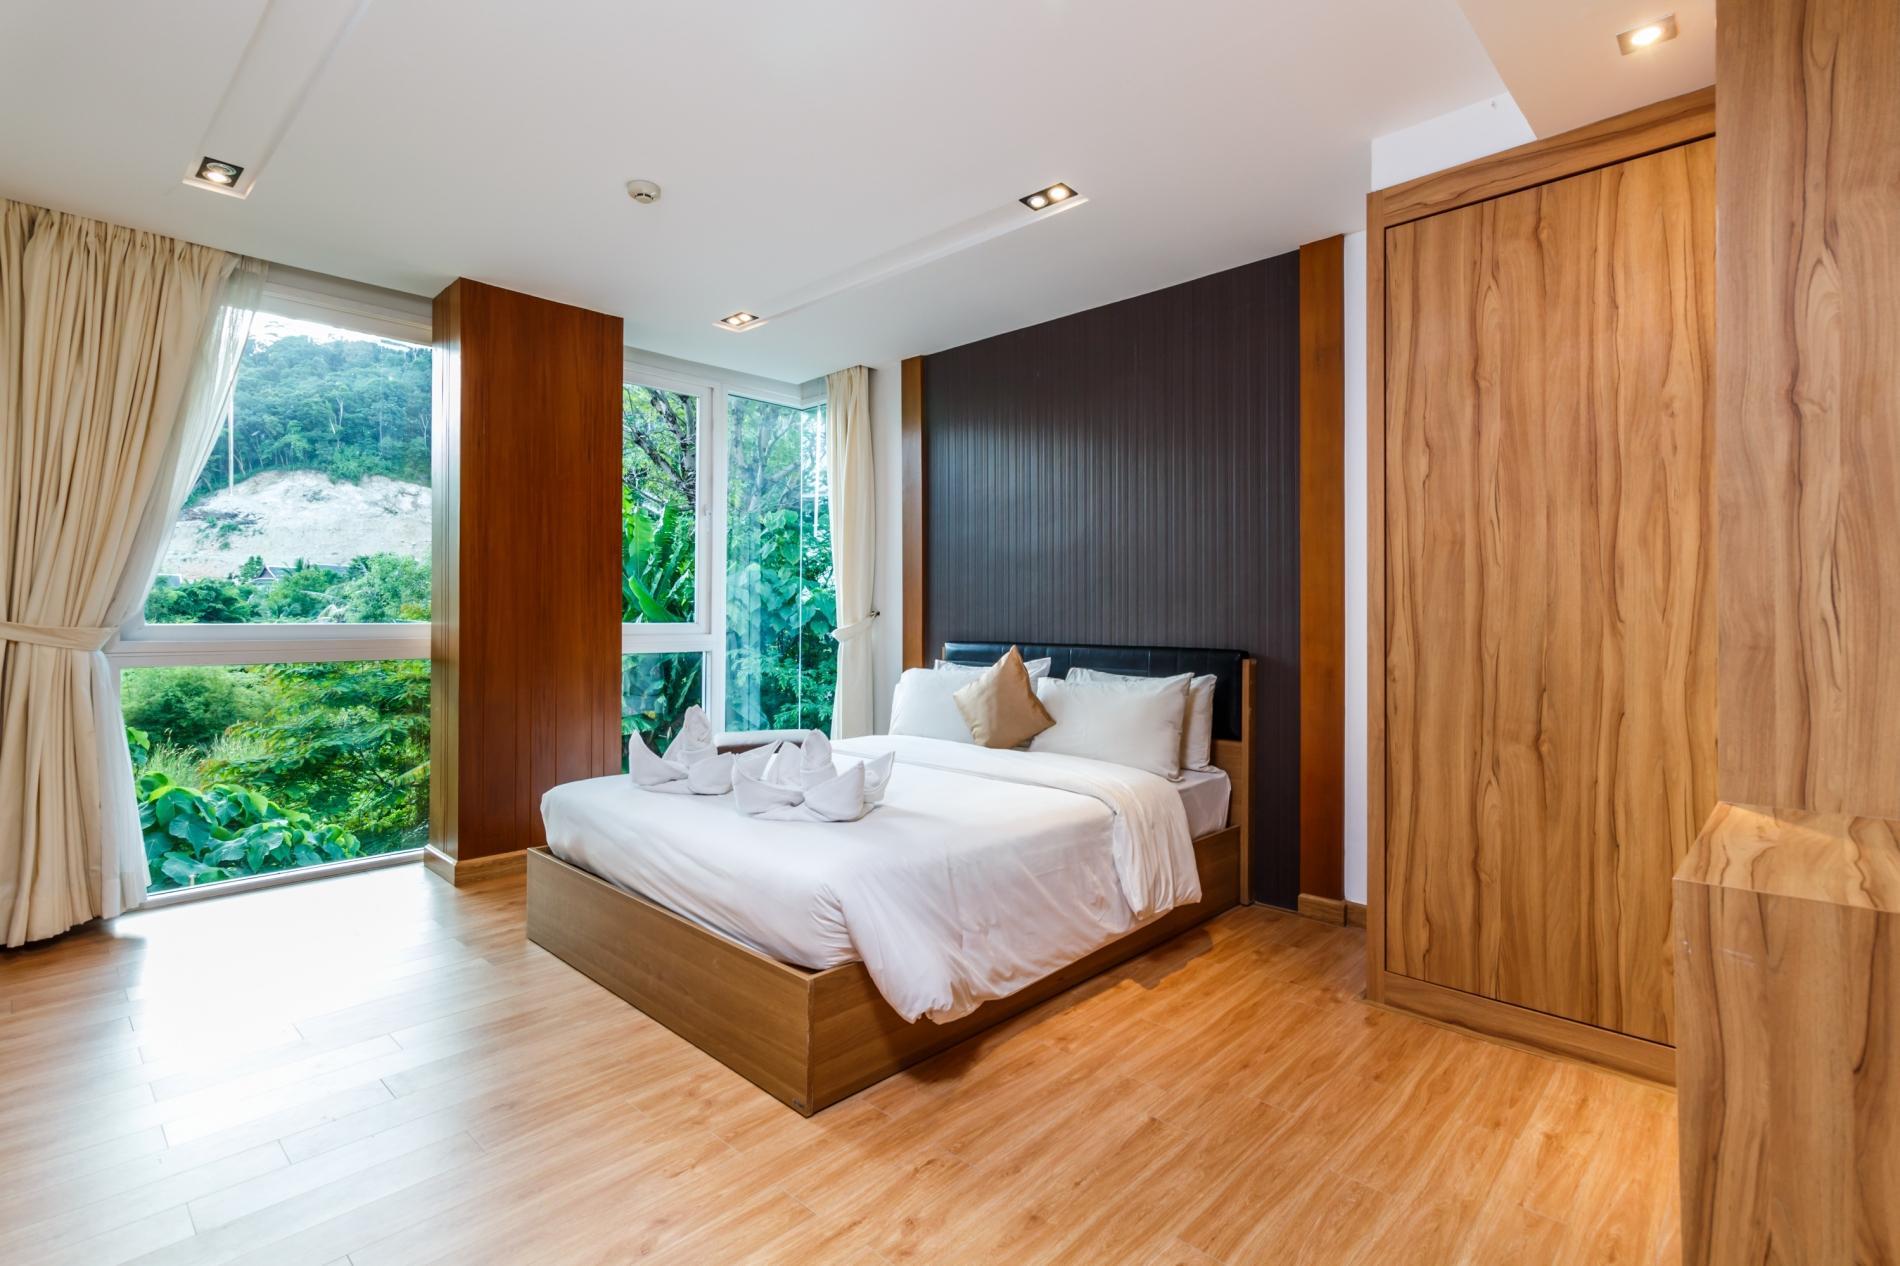 Apartment Privilege12 - Seaview 3 bedroom luxury apartment on Kalim bay photo 20176134